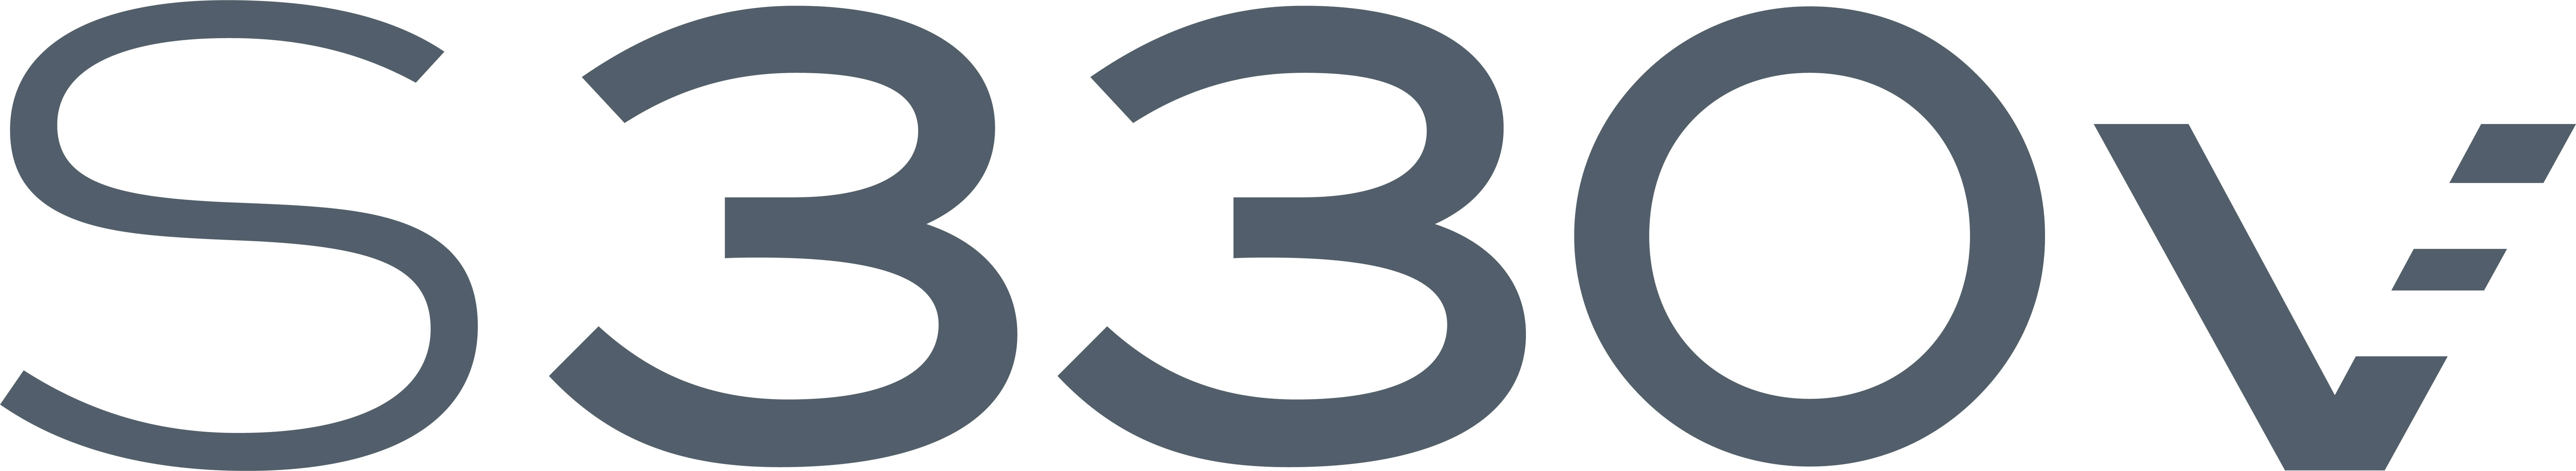 Sealine_S330v_Logo.jpg